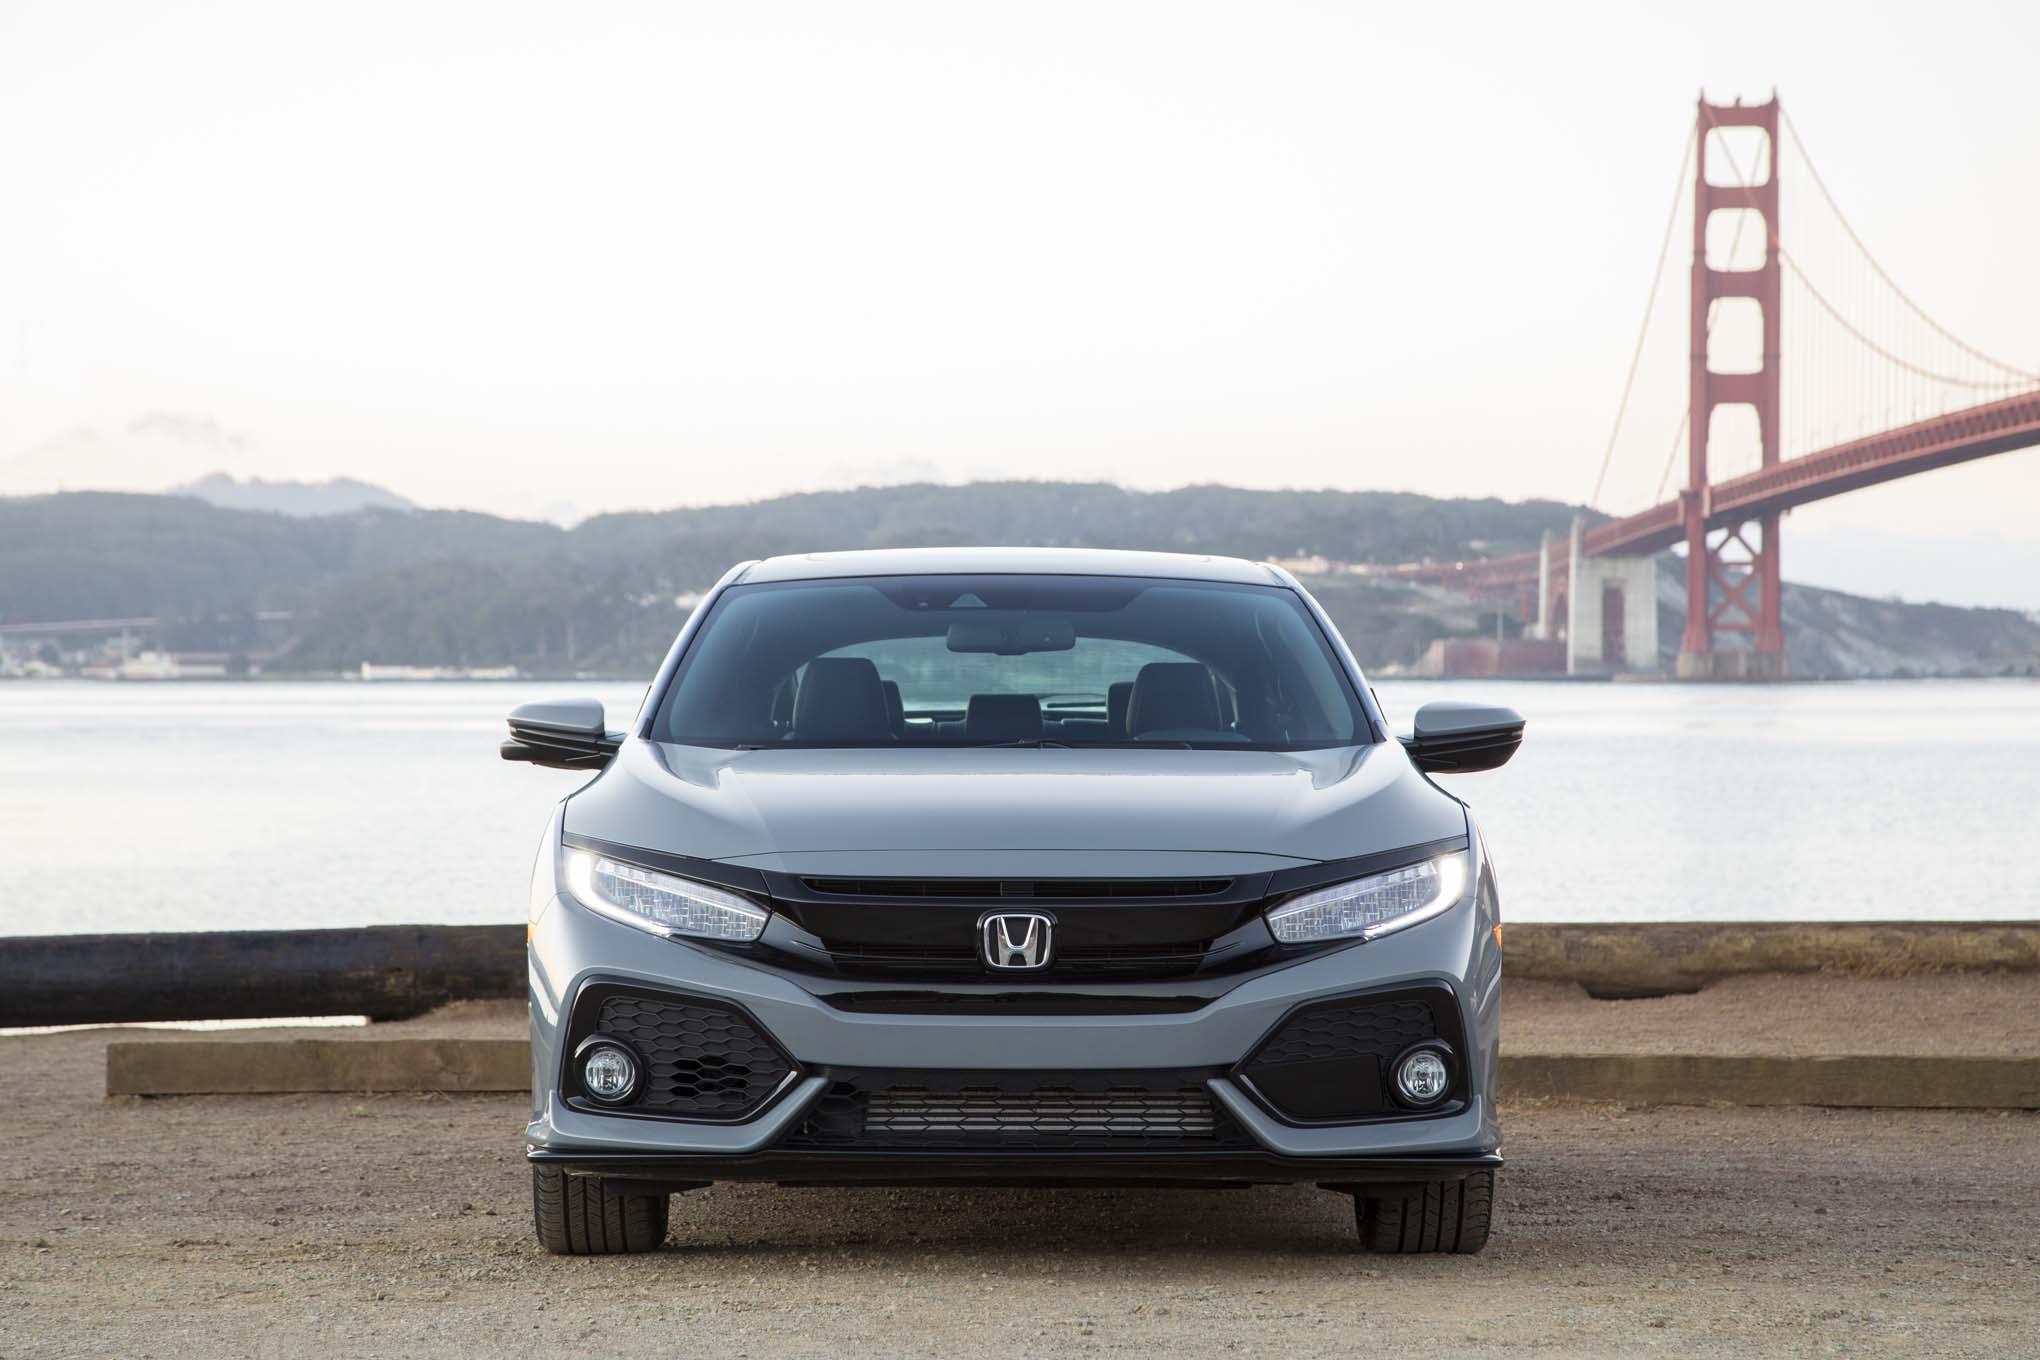 2017 Honda Civic Hatchback EX L w Navi First Drive Review